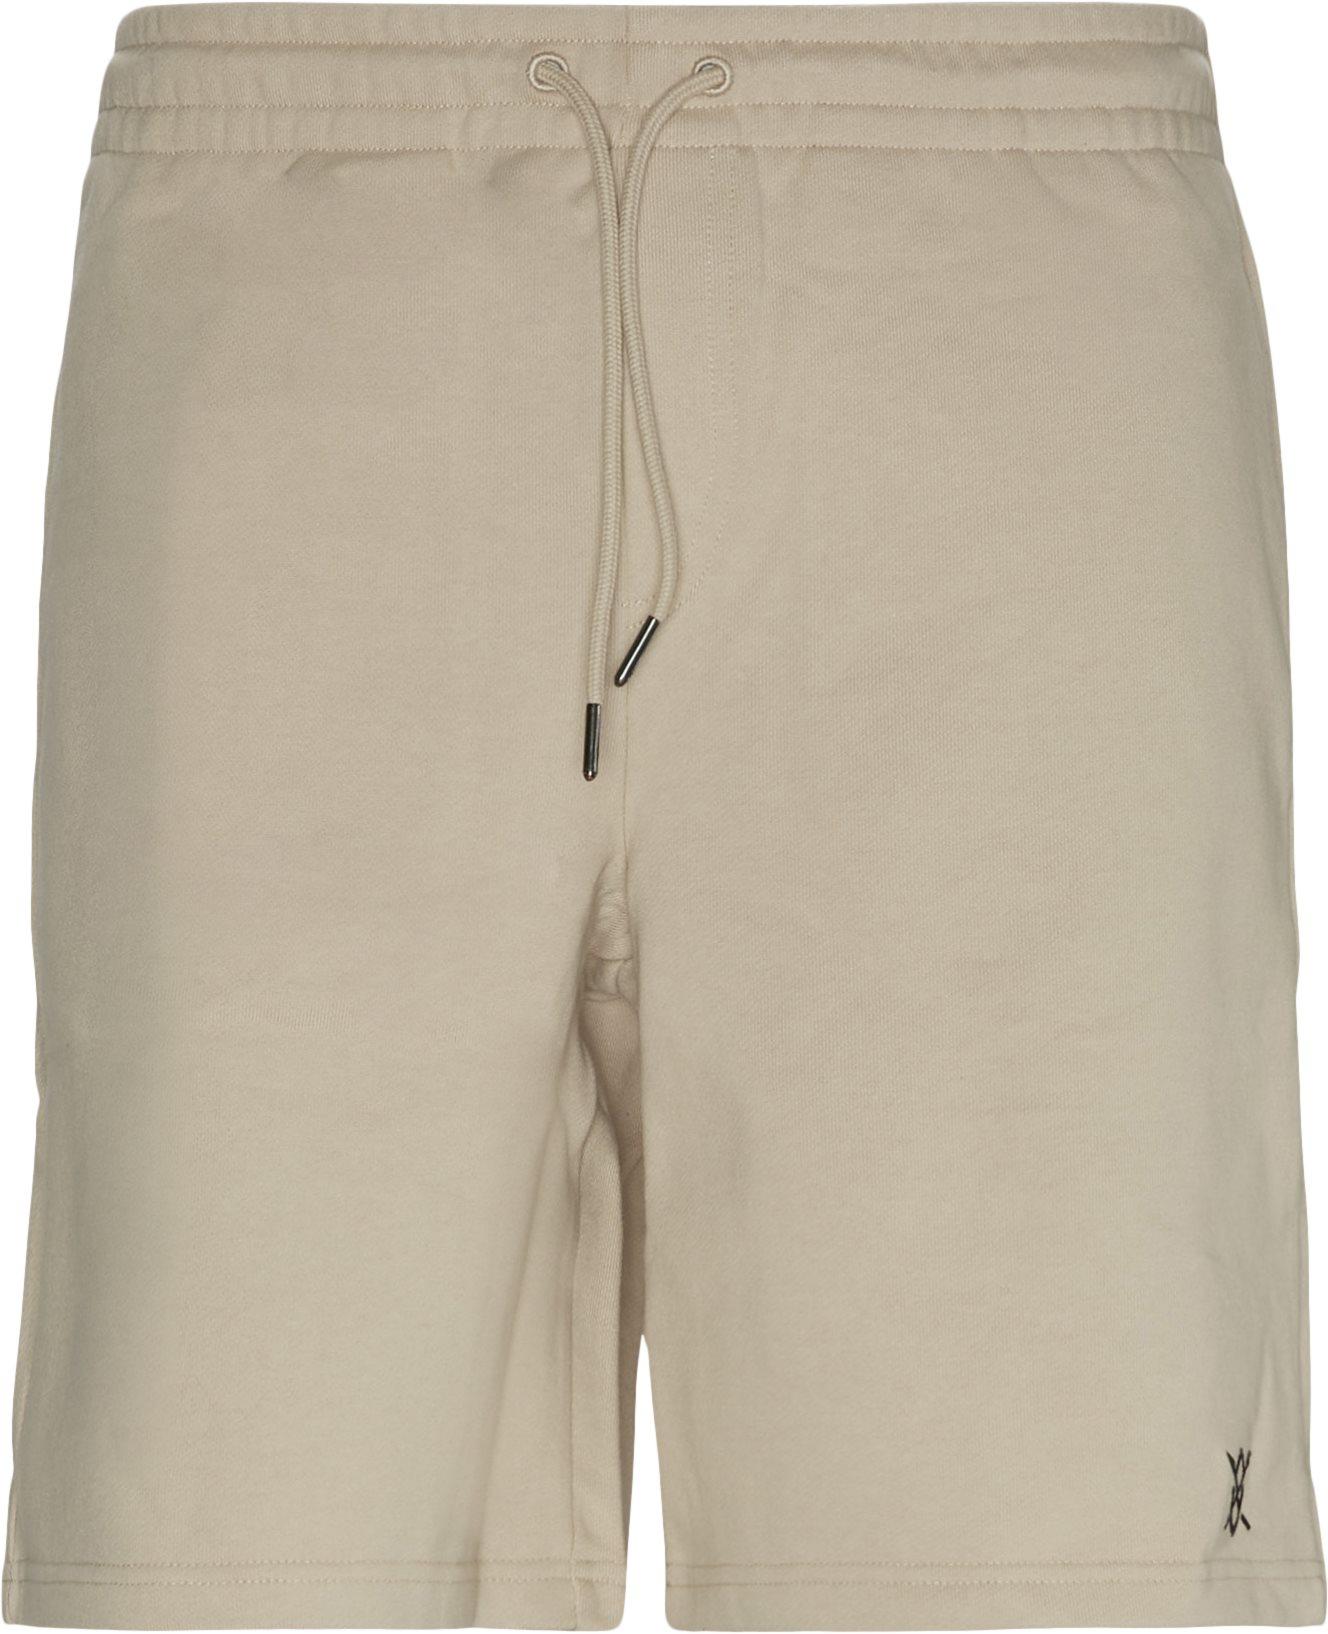 Eshort Shorts - Shorts - Regular fit - Sand